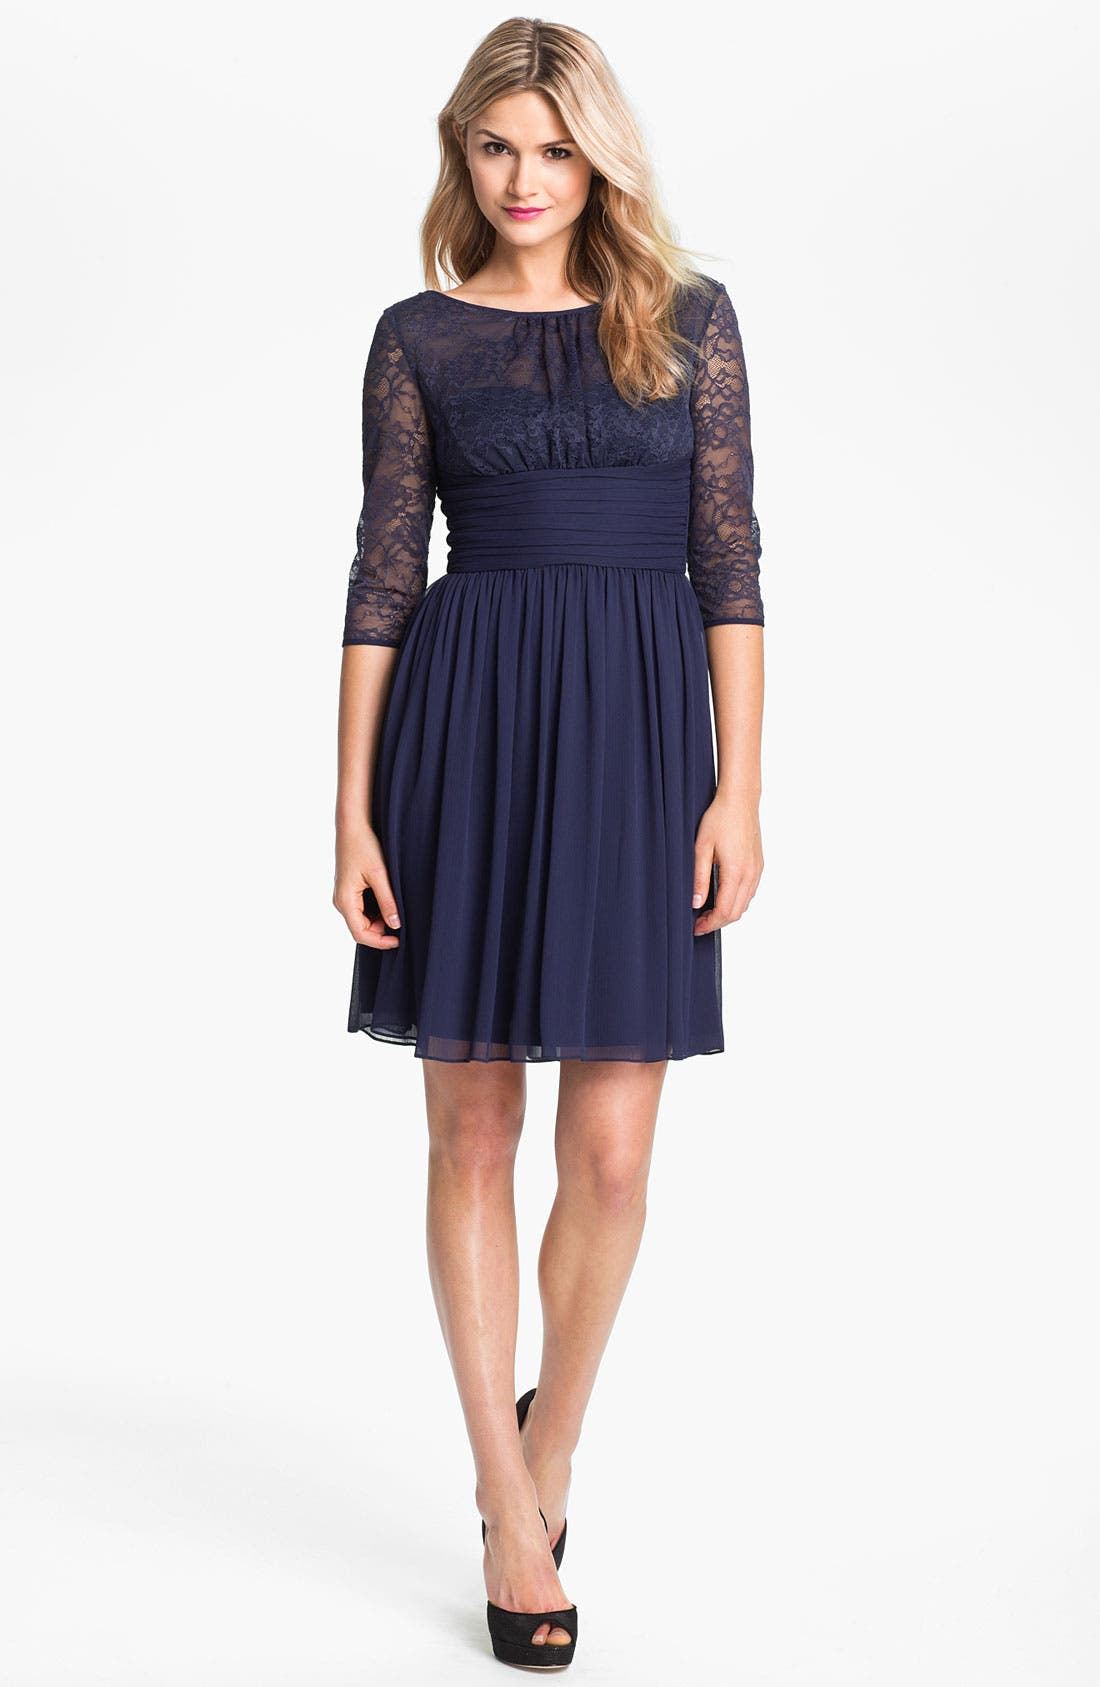 Alternate Image 1 Selected - Max & Cleo Lace Bodice Pleated Chiffon Dress